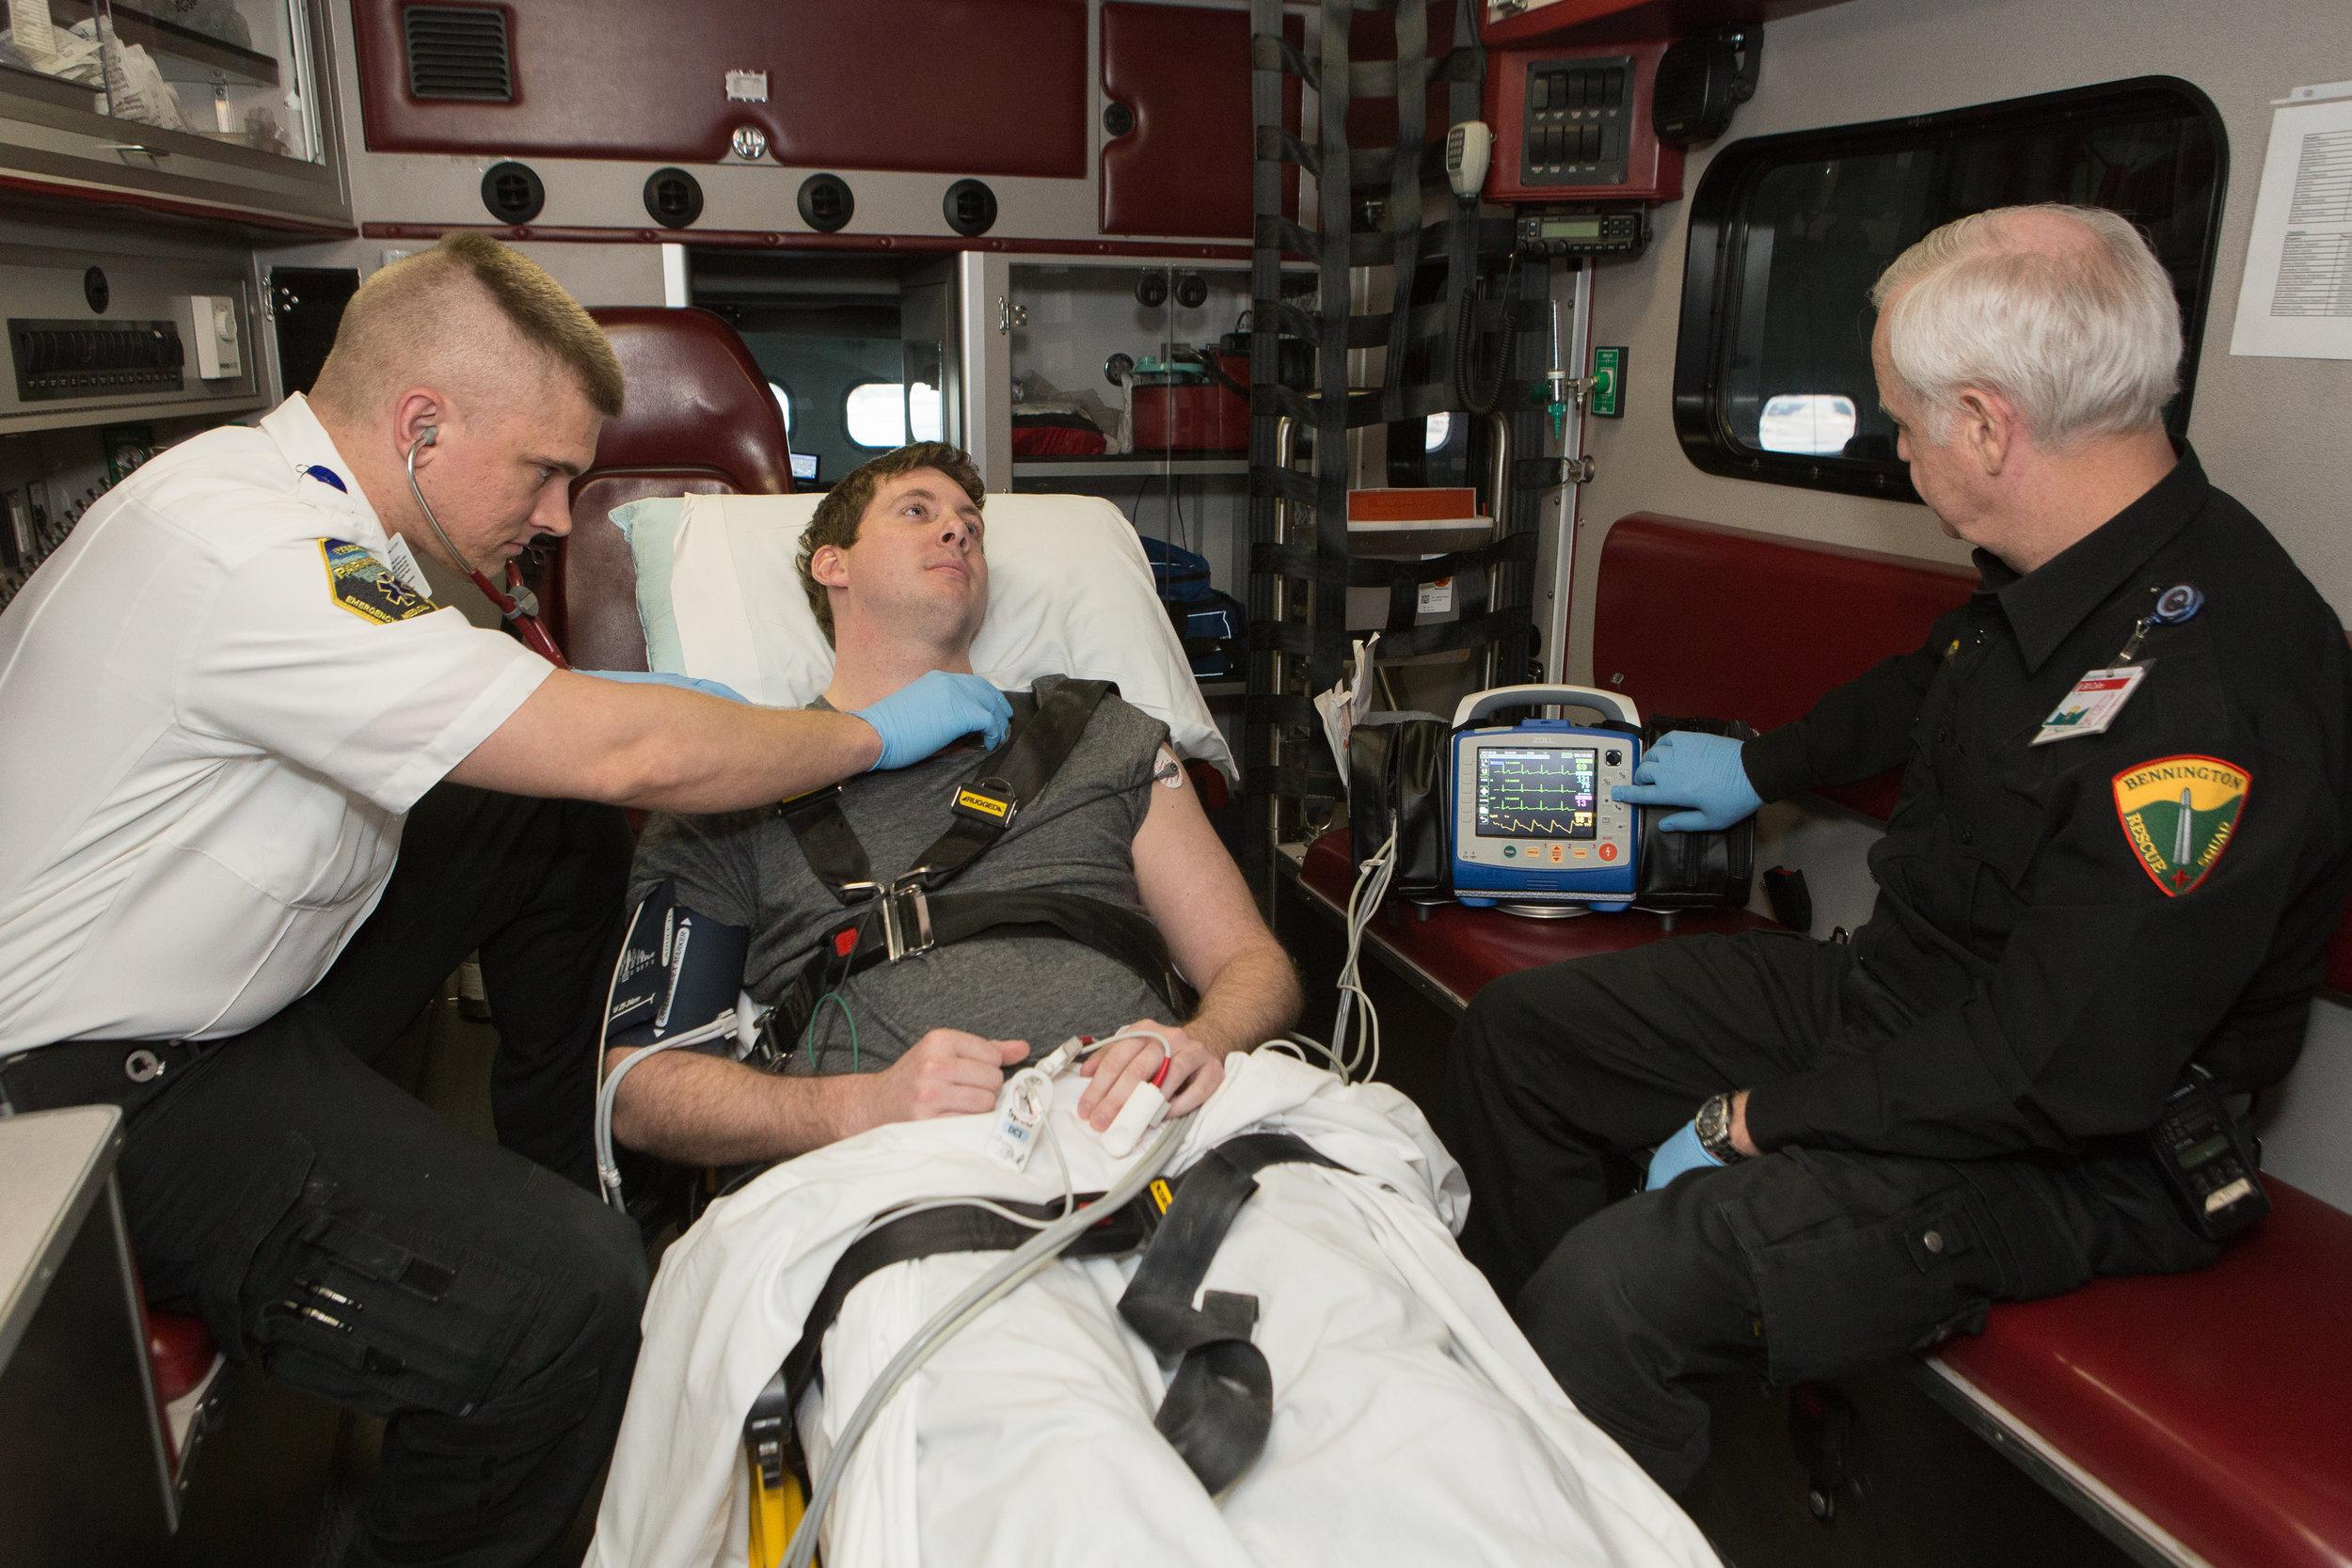 help us help you! - we need to replace life saving equipment